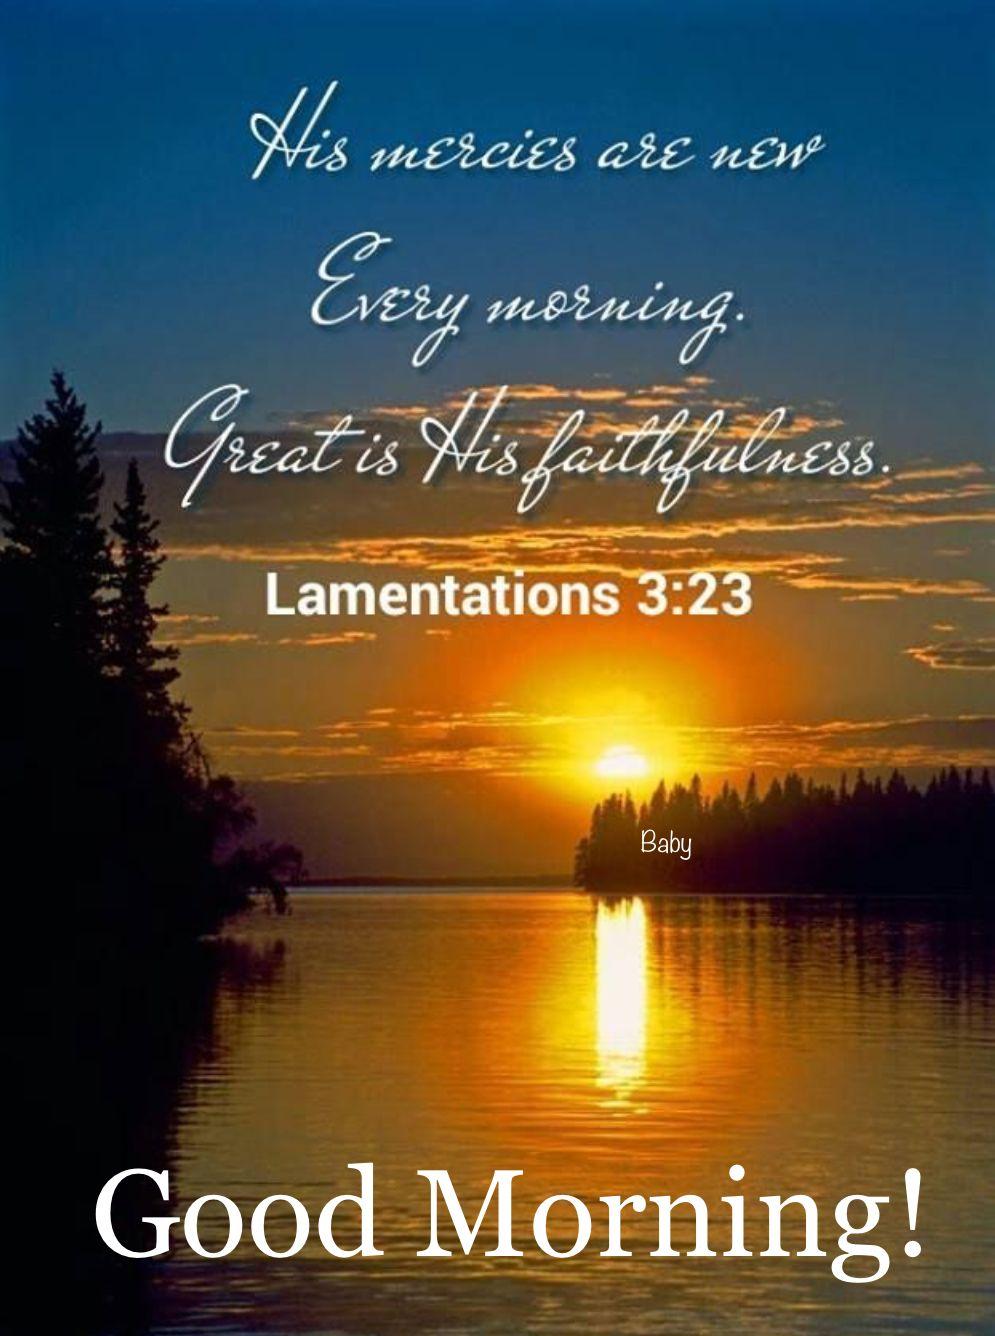 Good Morning Good Morning Bible Quotes Morning Bible Quotes Good Morning Images